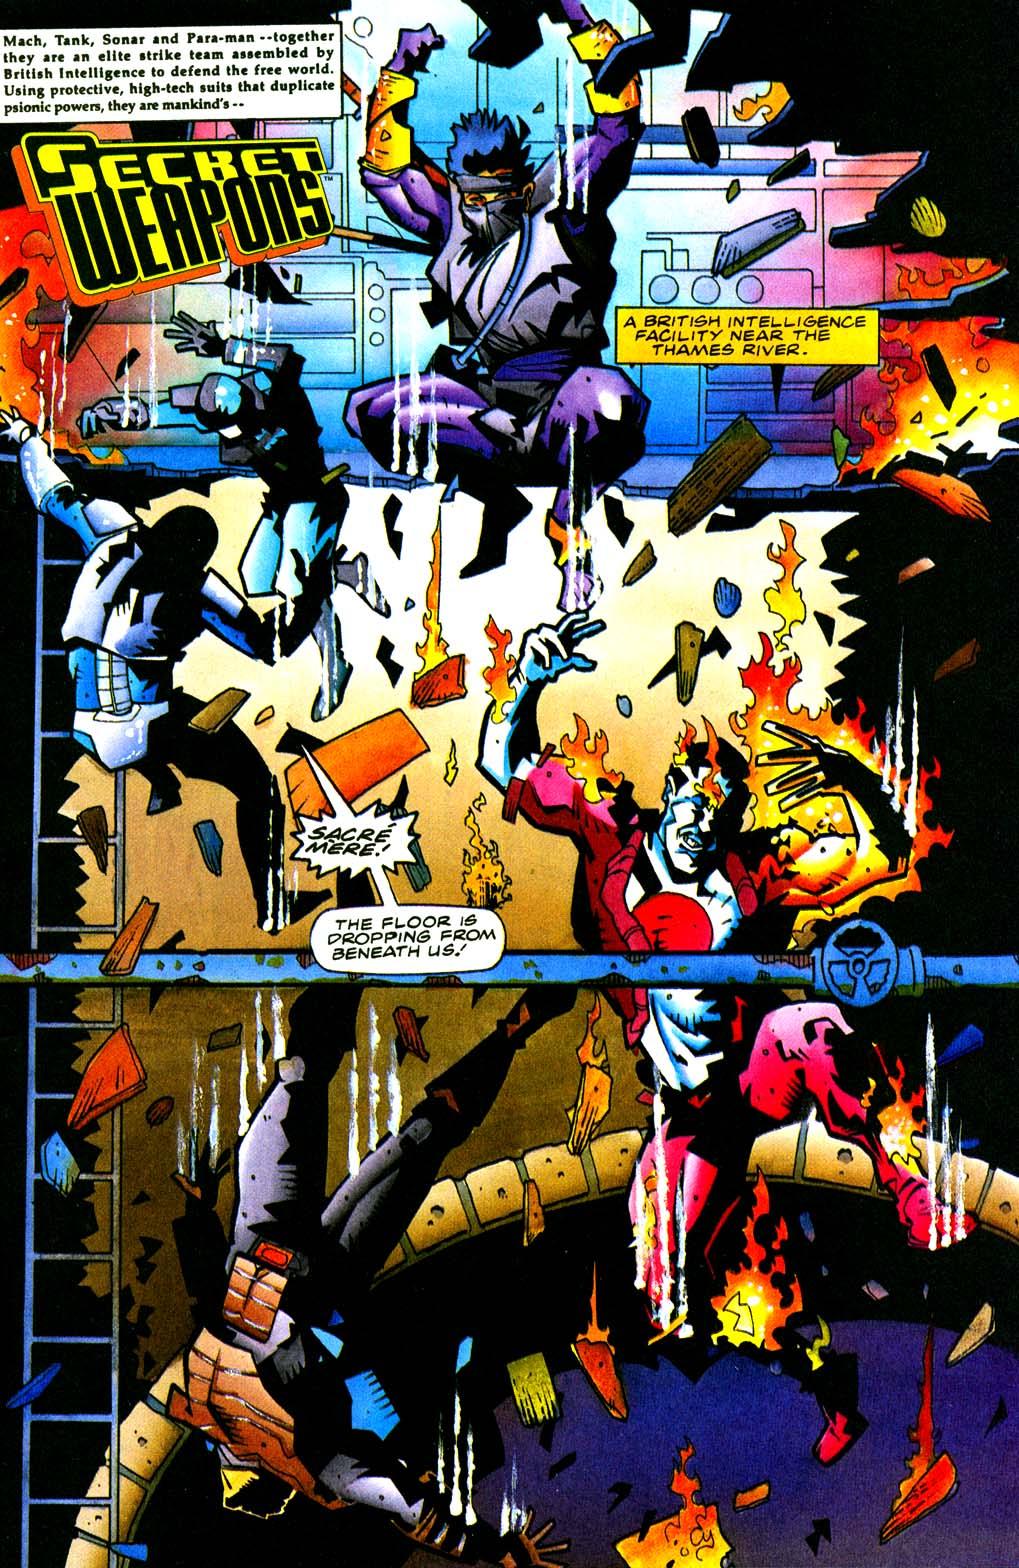 Read online Secret Weapons comic -  Issue #21 - 2